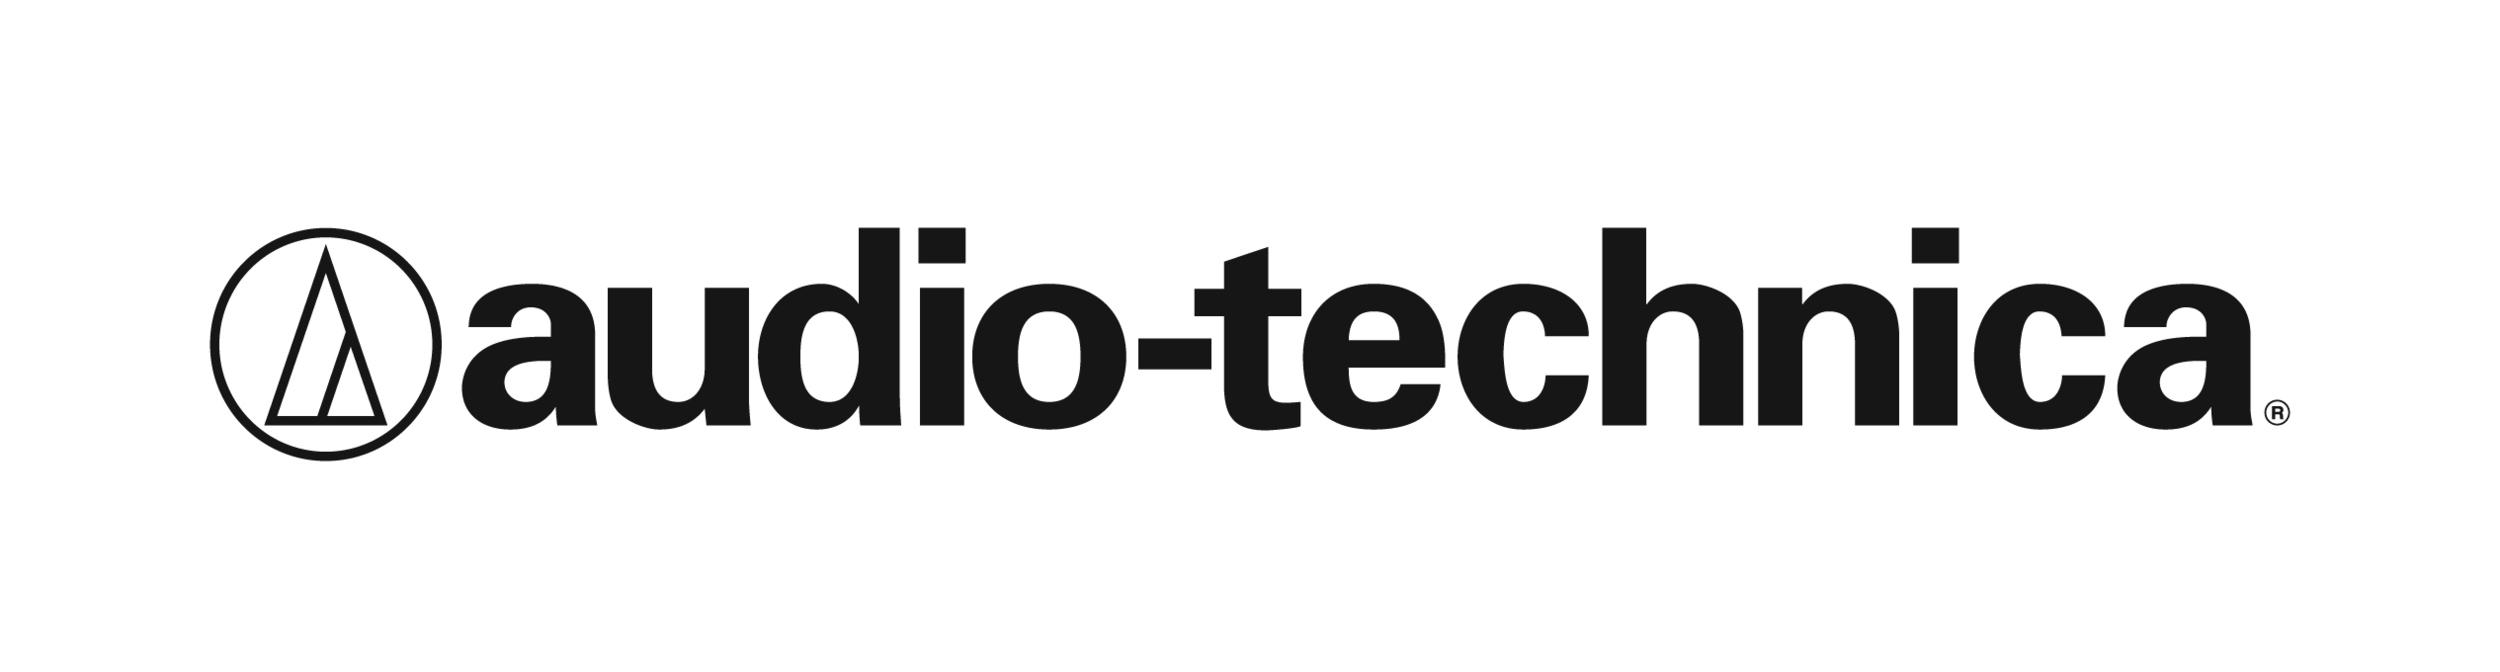 audio_technica_logo.jpg